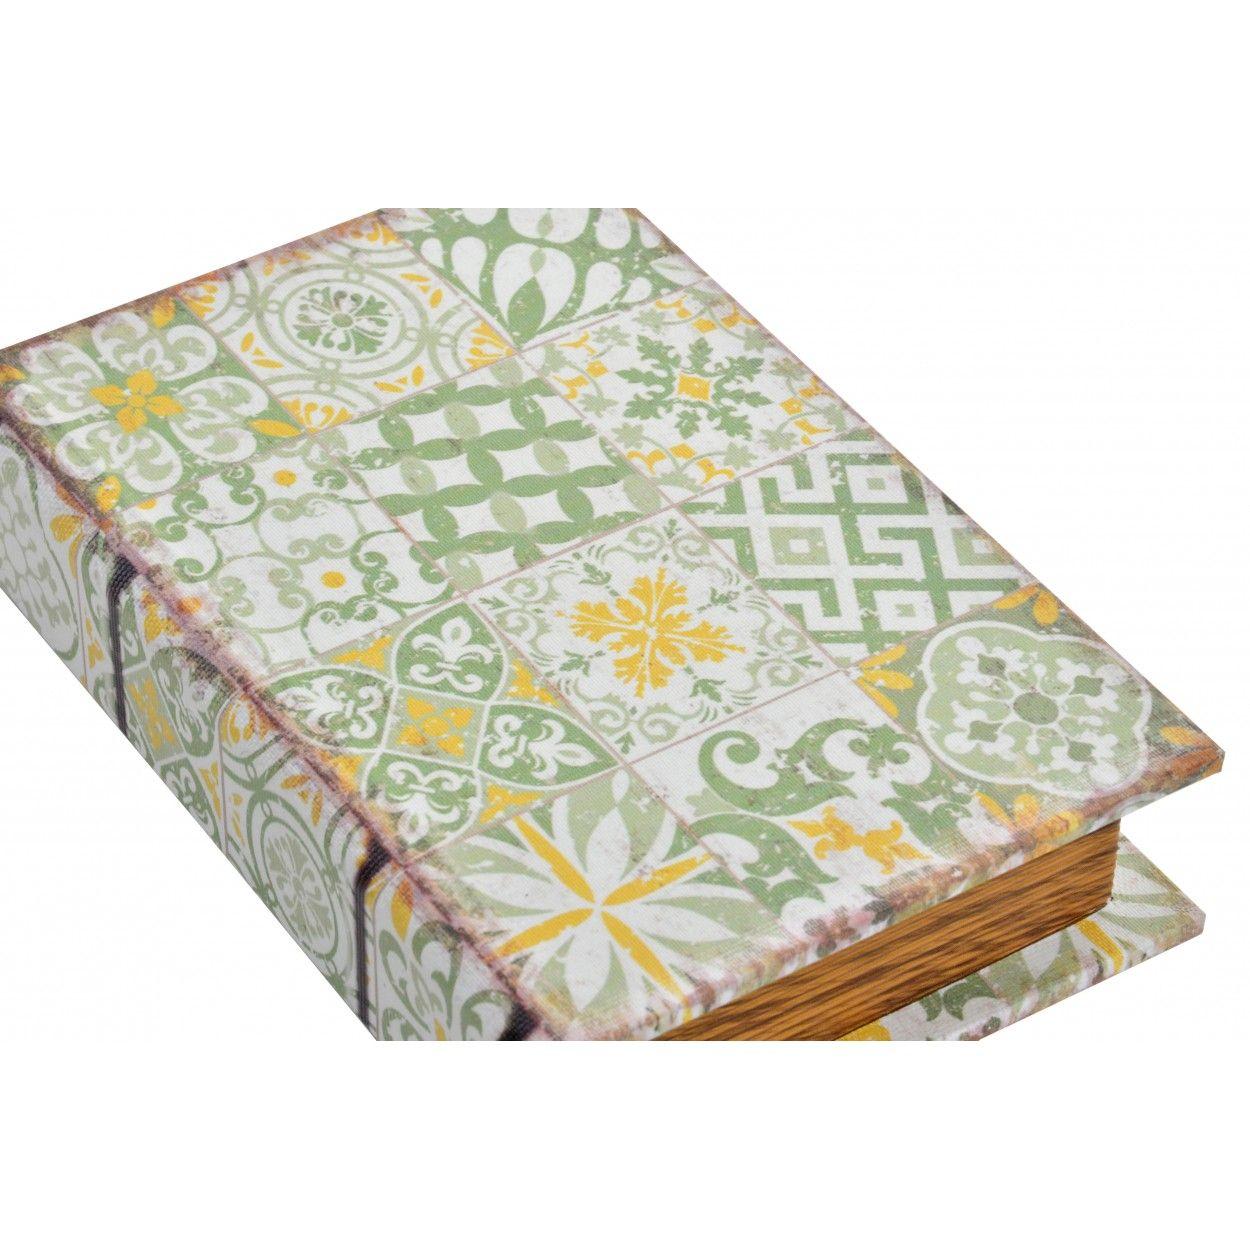 Comprar Cajas Decorativas Para Almacenar